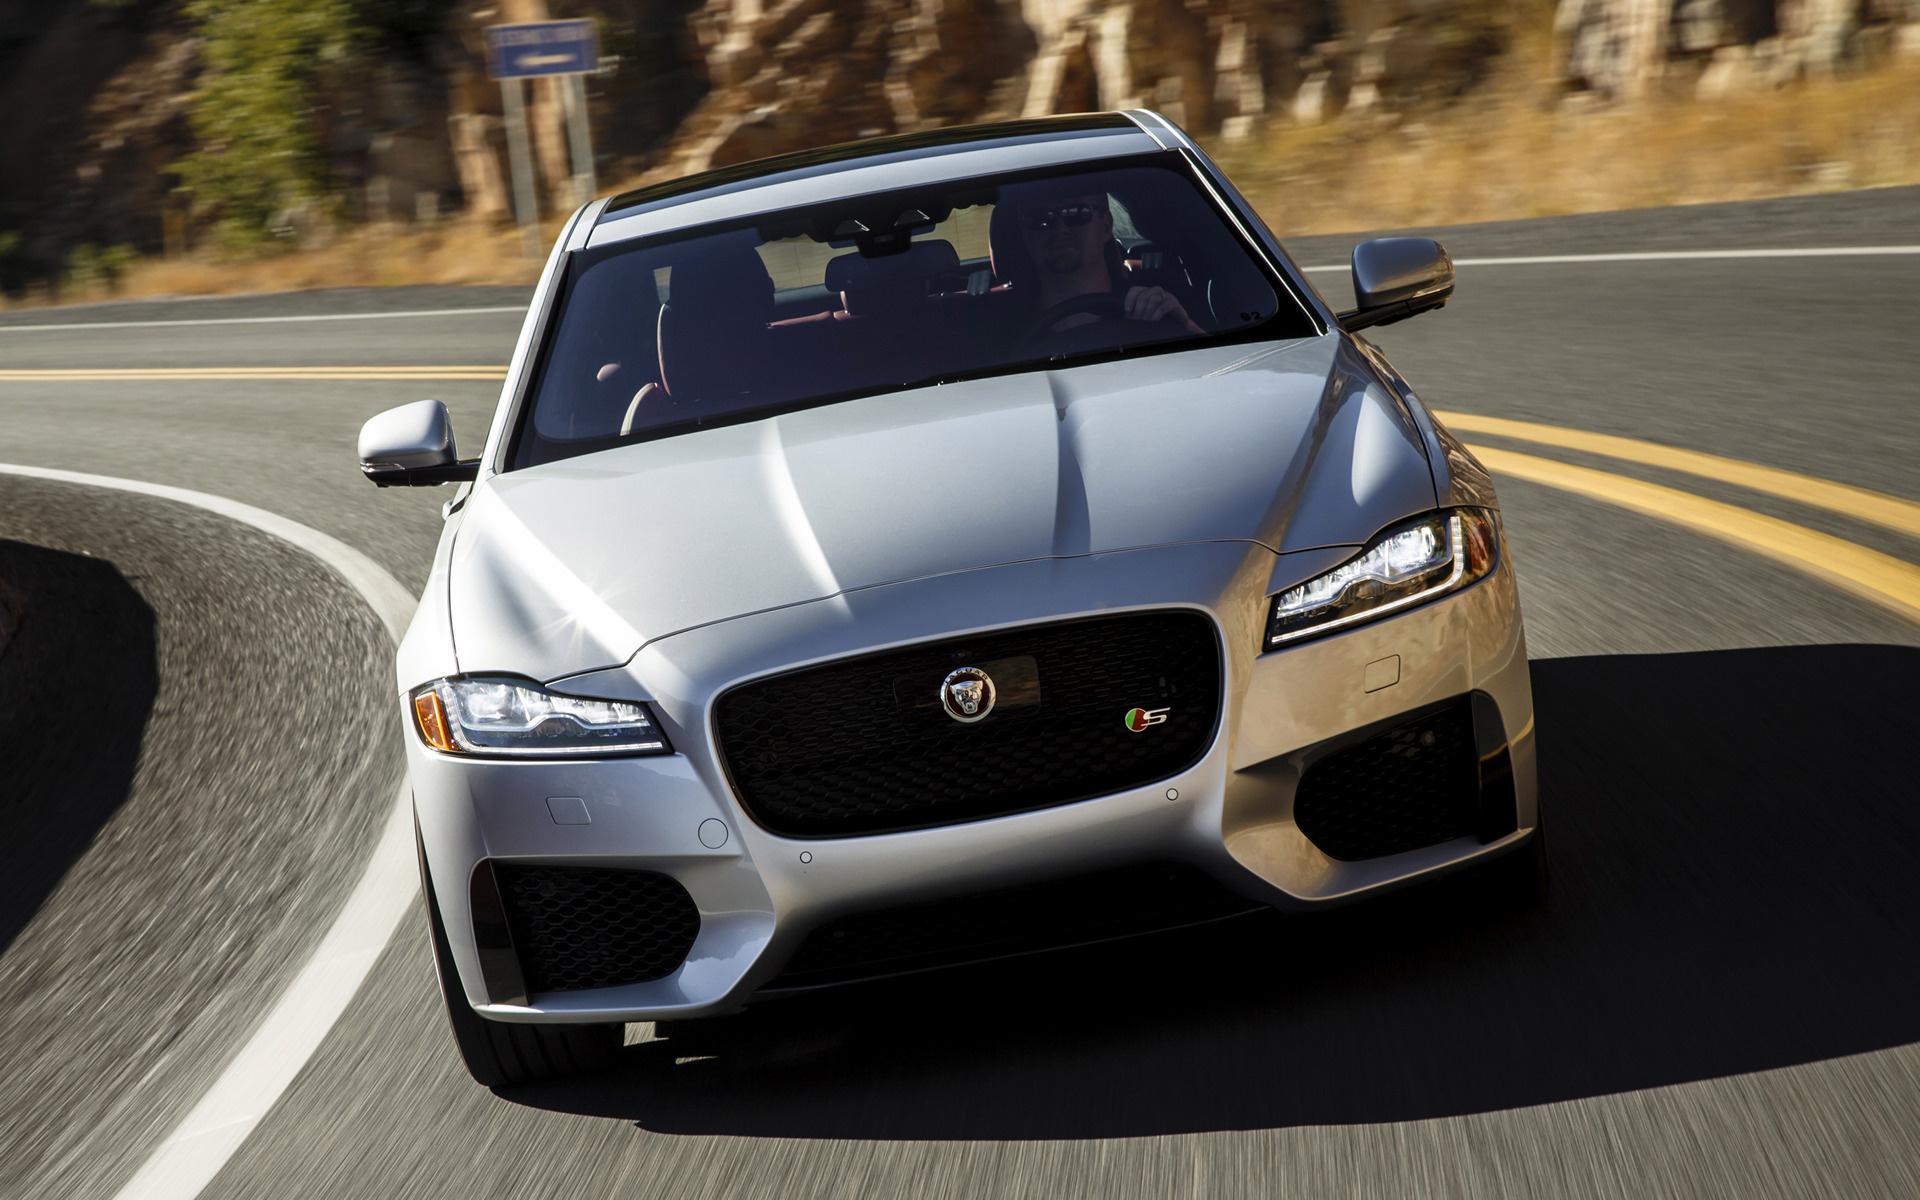 2016 Jaguar XF S US Wallpapers And HD Images Car Pixel